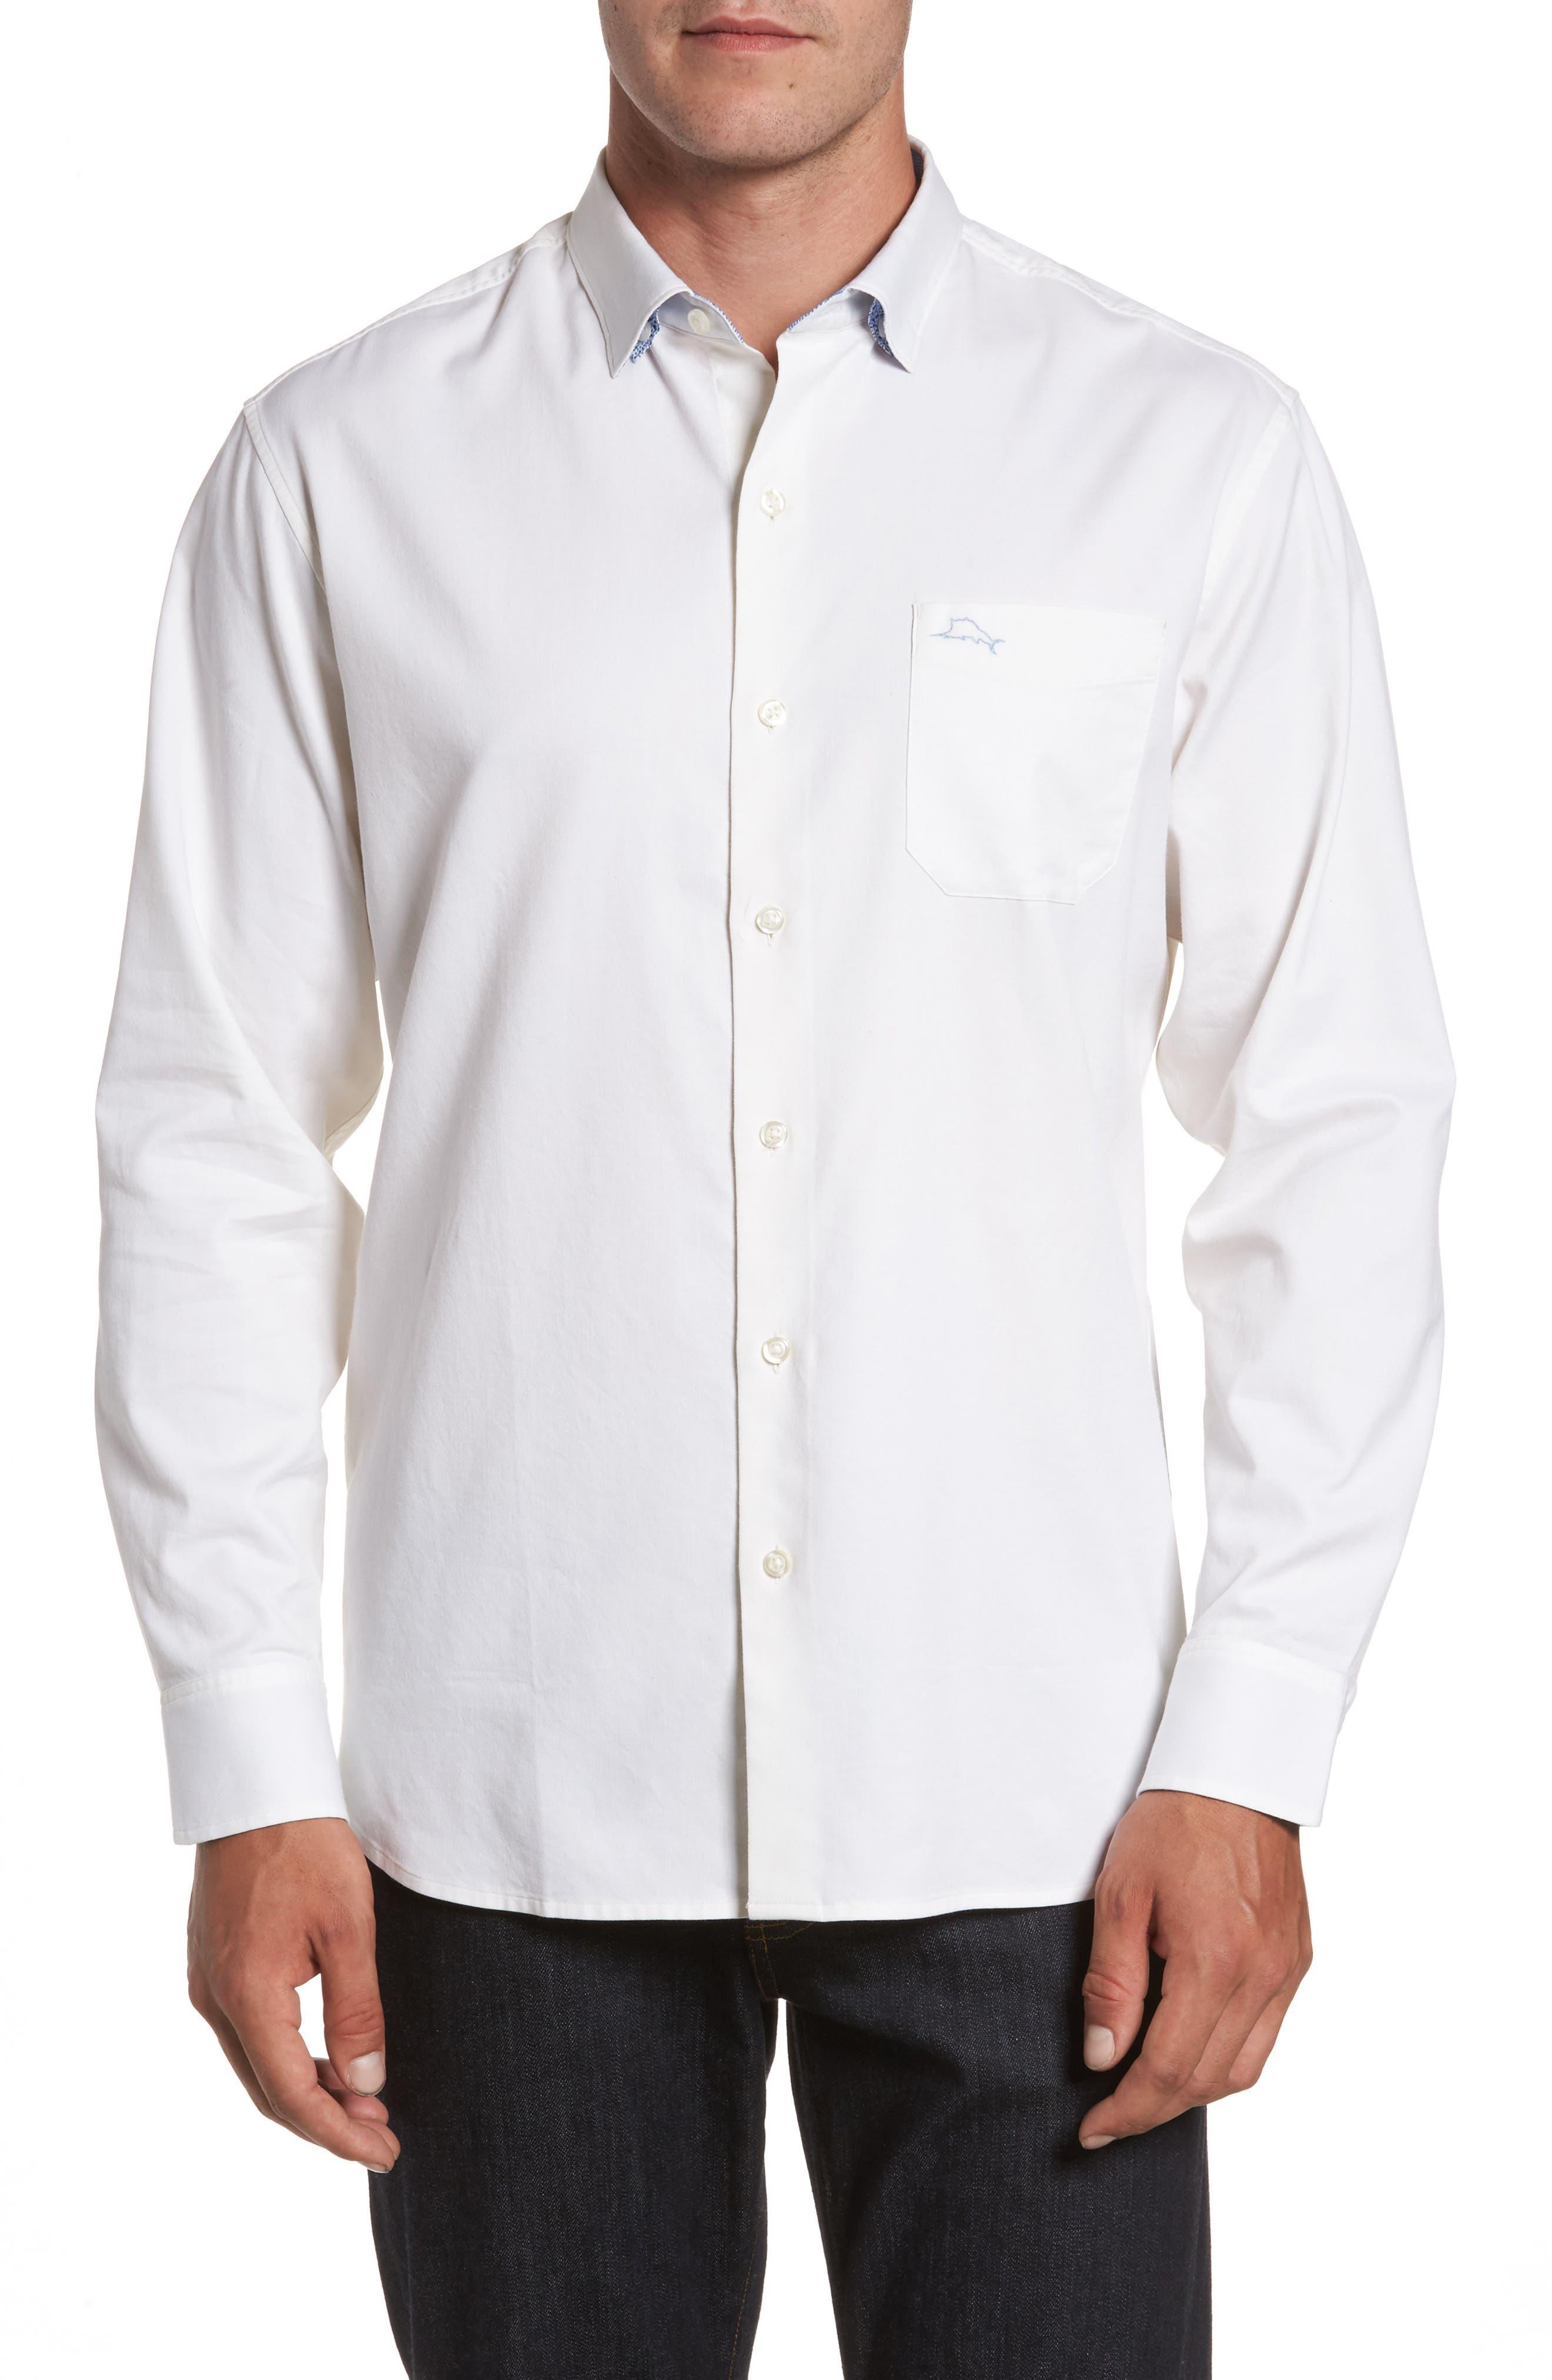 Main Image - Tommy Bahama Oasis Twill Sport Shirt